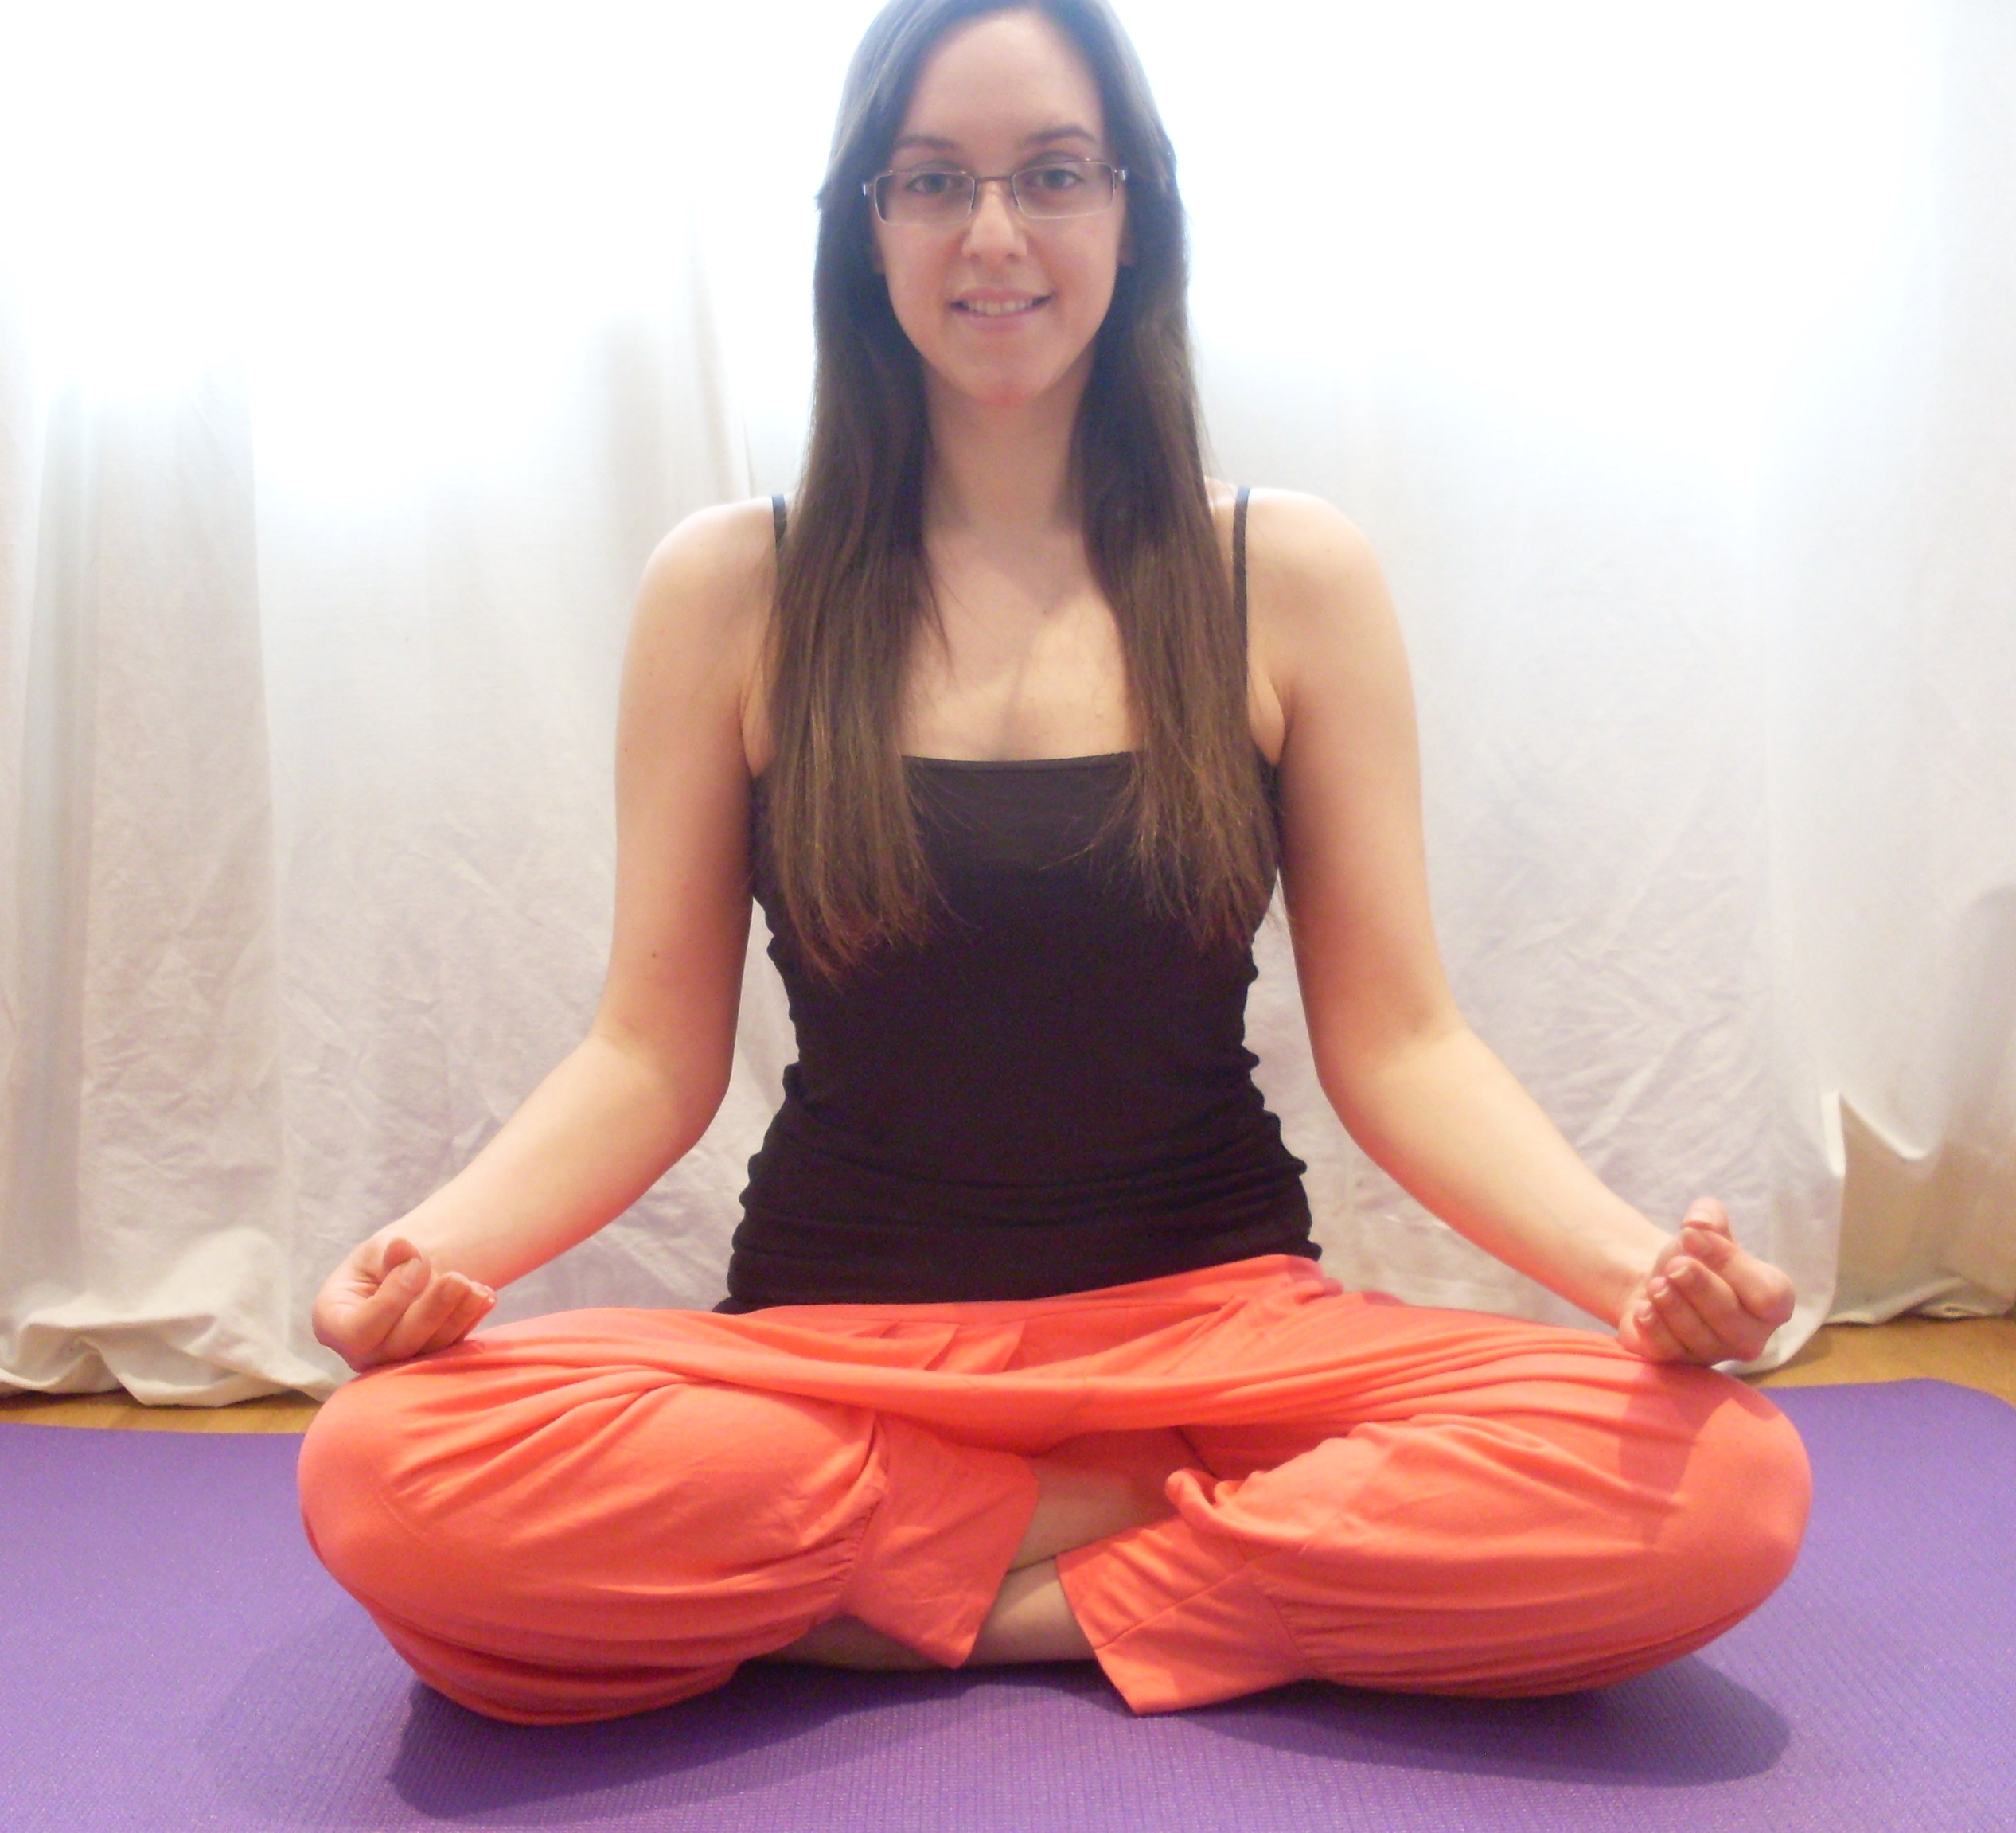 I teach feel good yoga classes in Cambridge UK. Classes